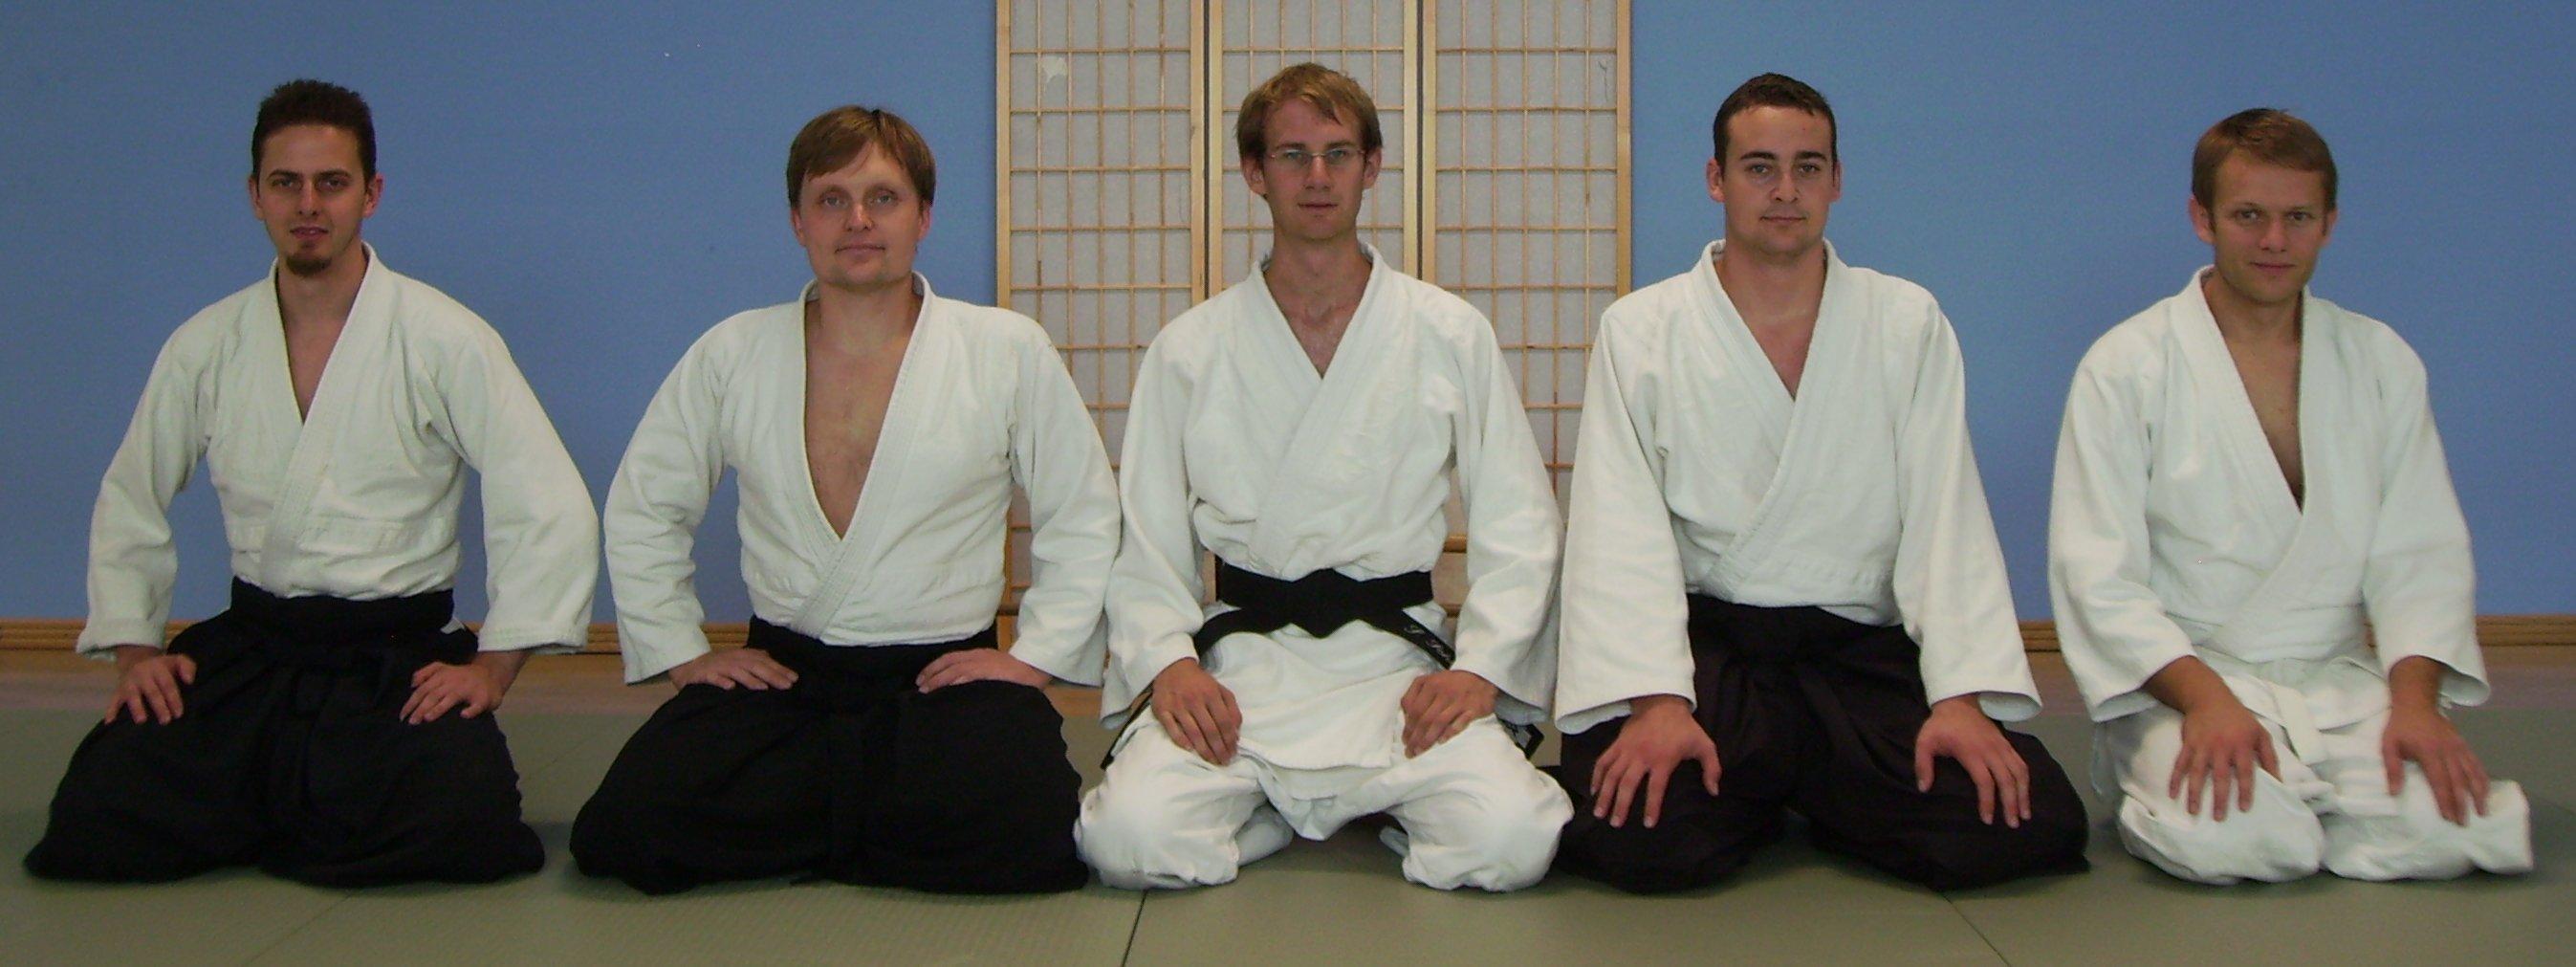 v.l.n.r: Alex (Uke), Elmar (Prüfer), Stefan (Prüfling), Andreas (Uke), Christoph (Uke)